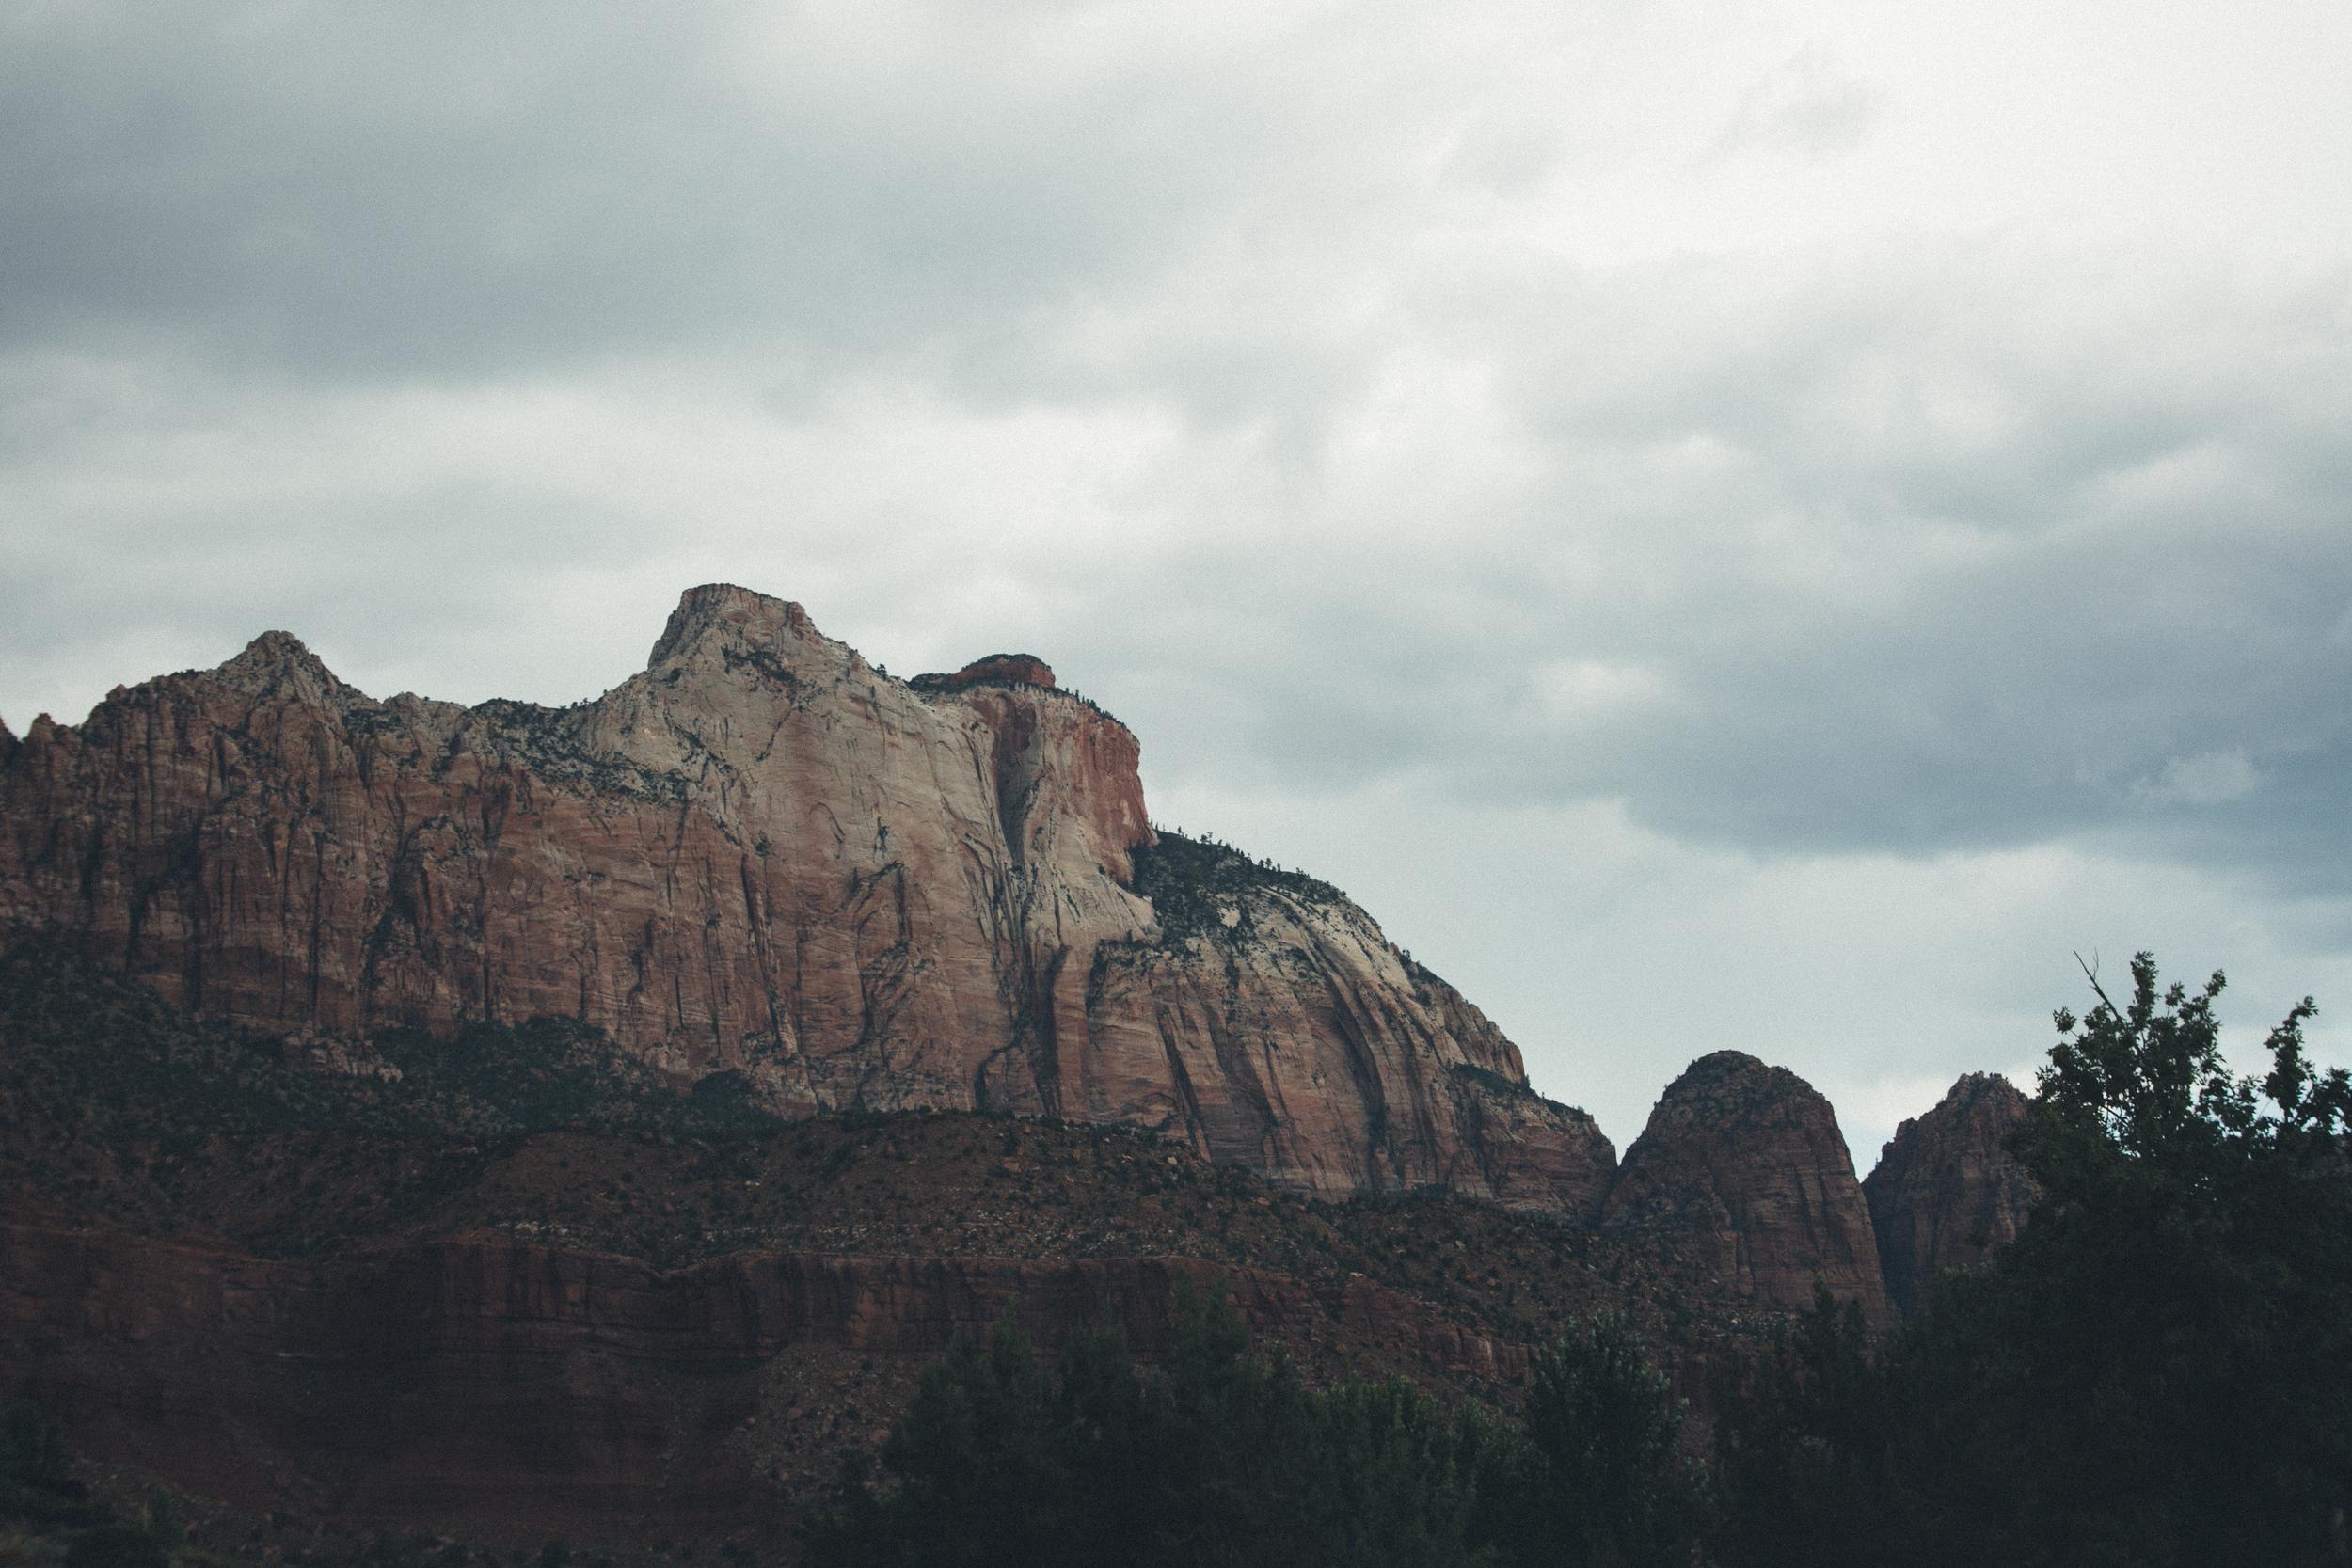 Majestic Zion National Park